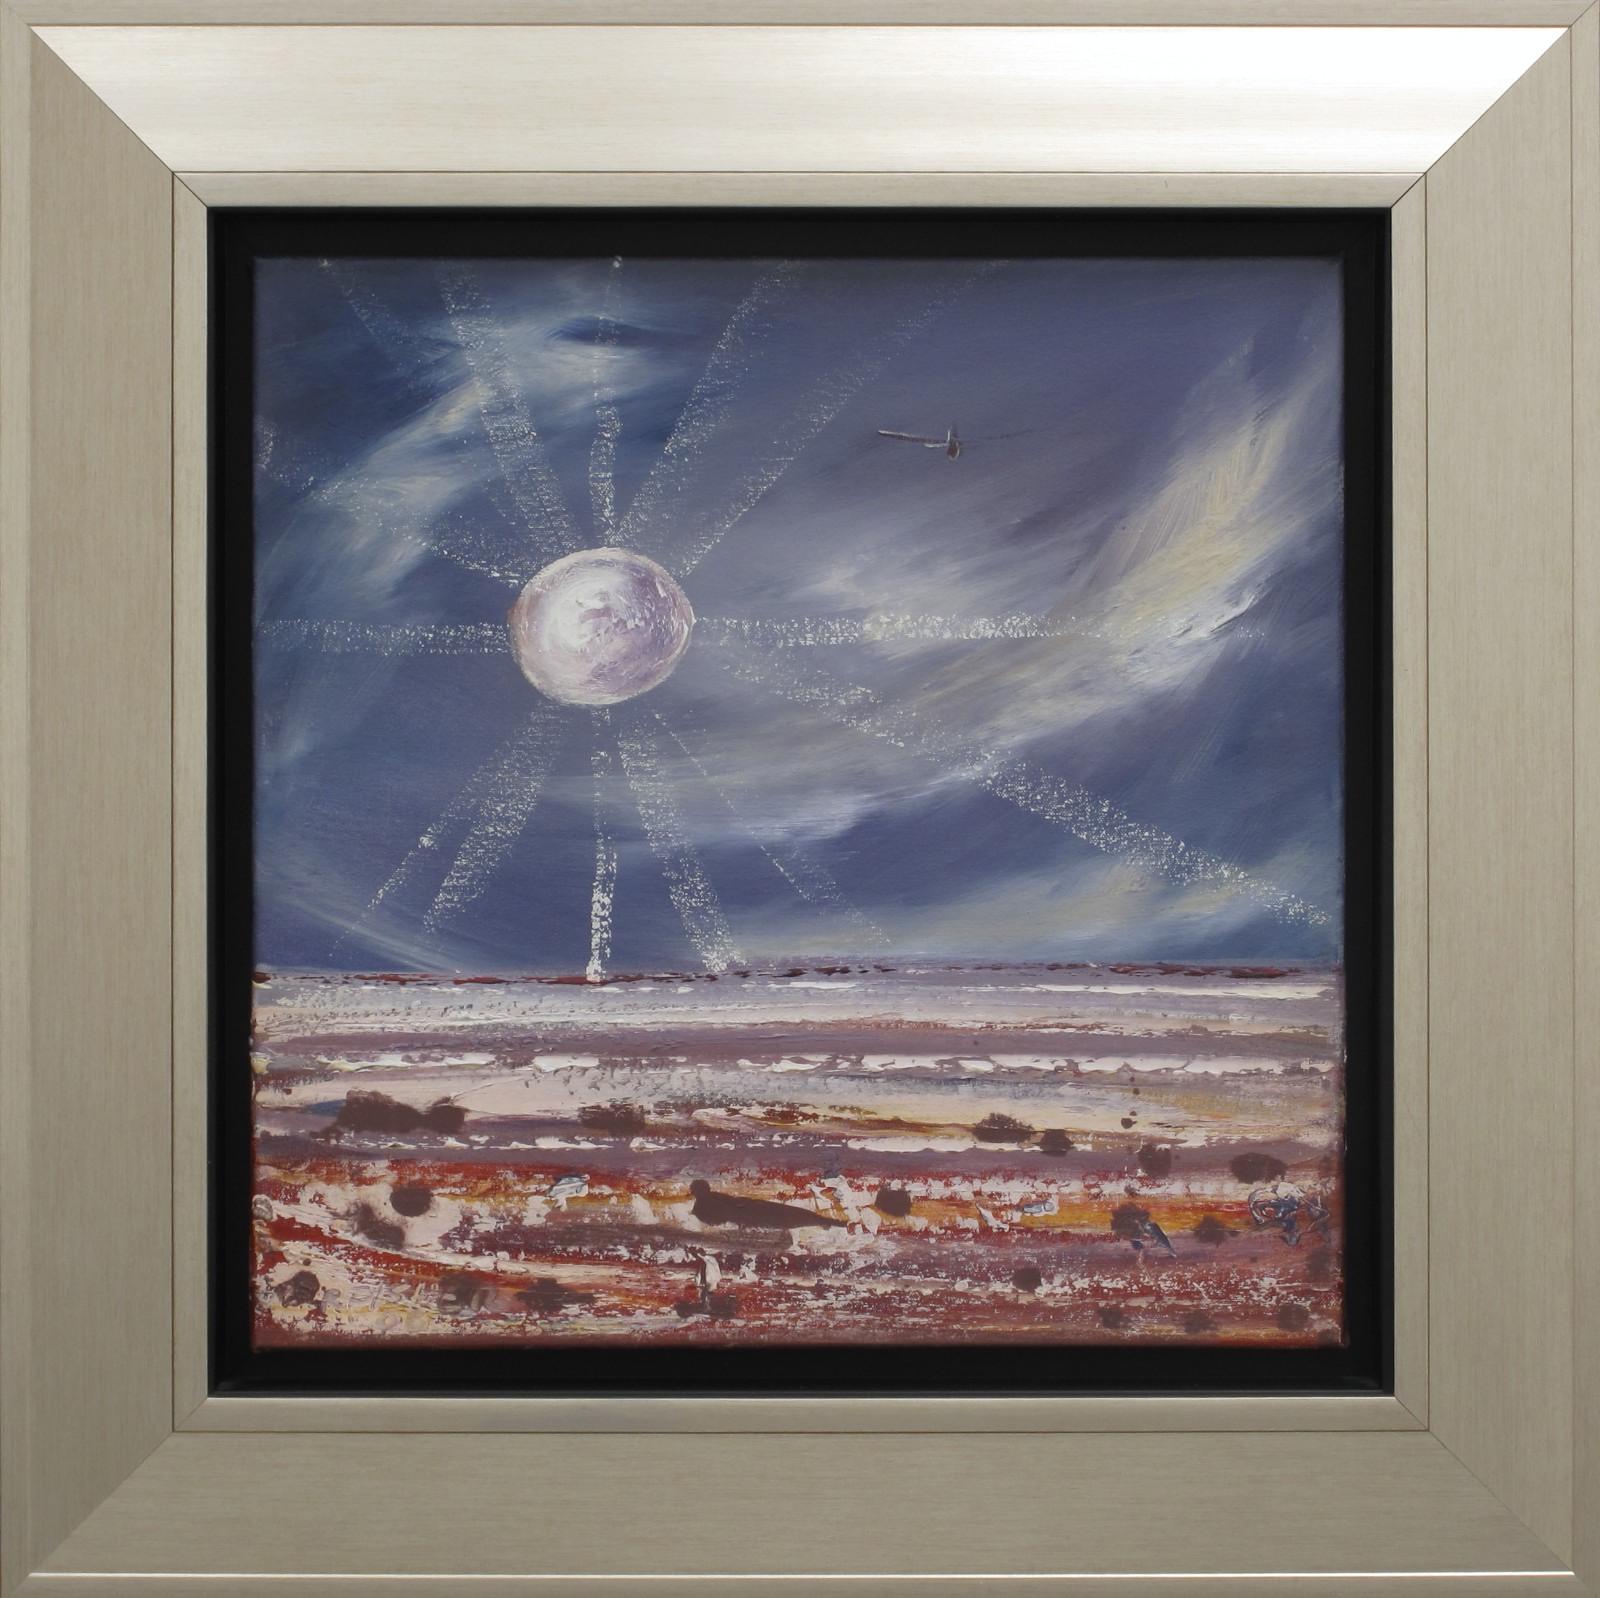 Robert Fisher. Last Flight Lake Eyre Moon III. 66cm x 66cm #9436.